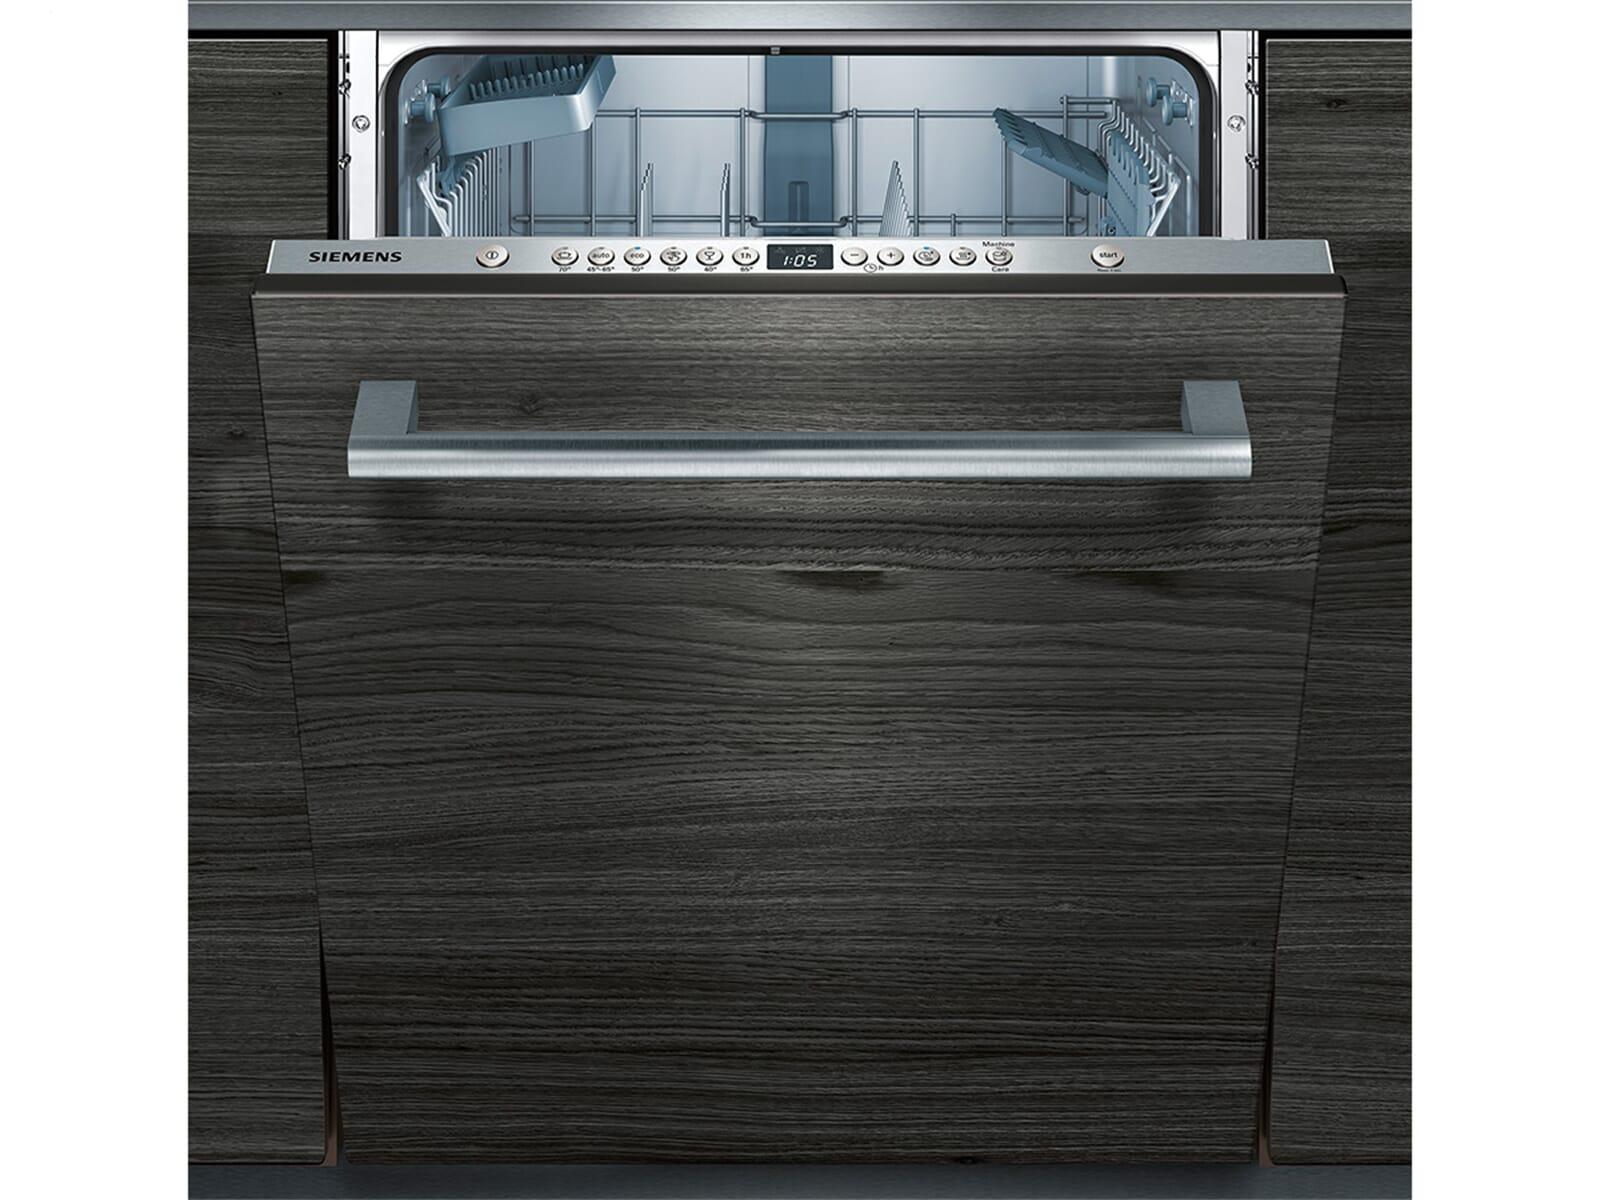 Siemens Kühlschrank Datenblatt : Siemens sn ce vollintegrierbarer einbaugeschirrspüler